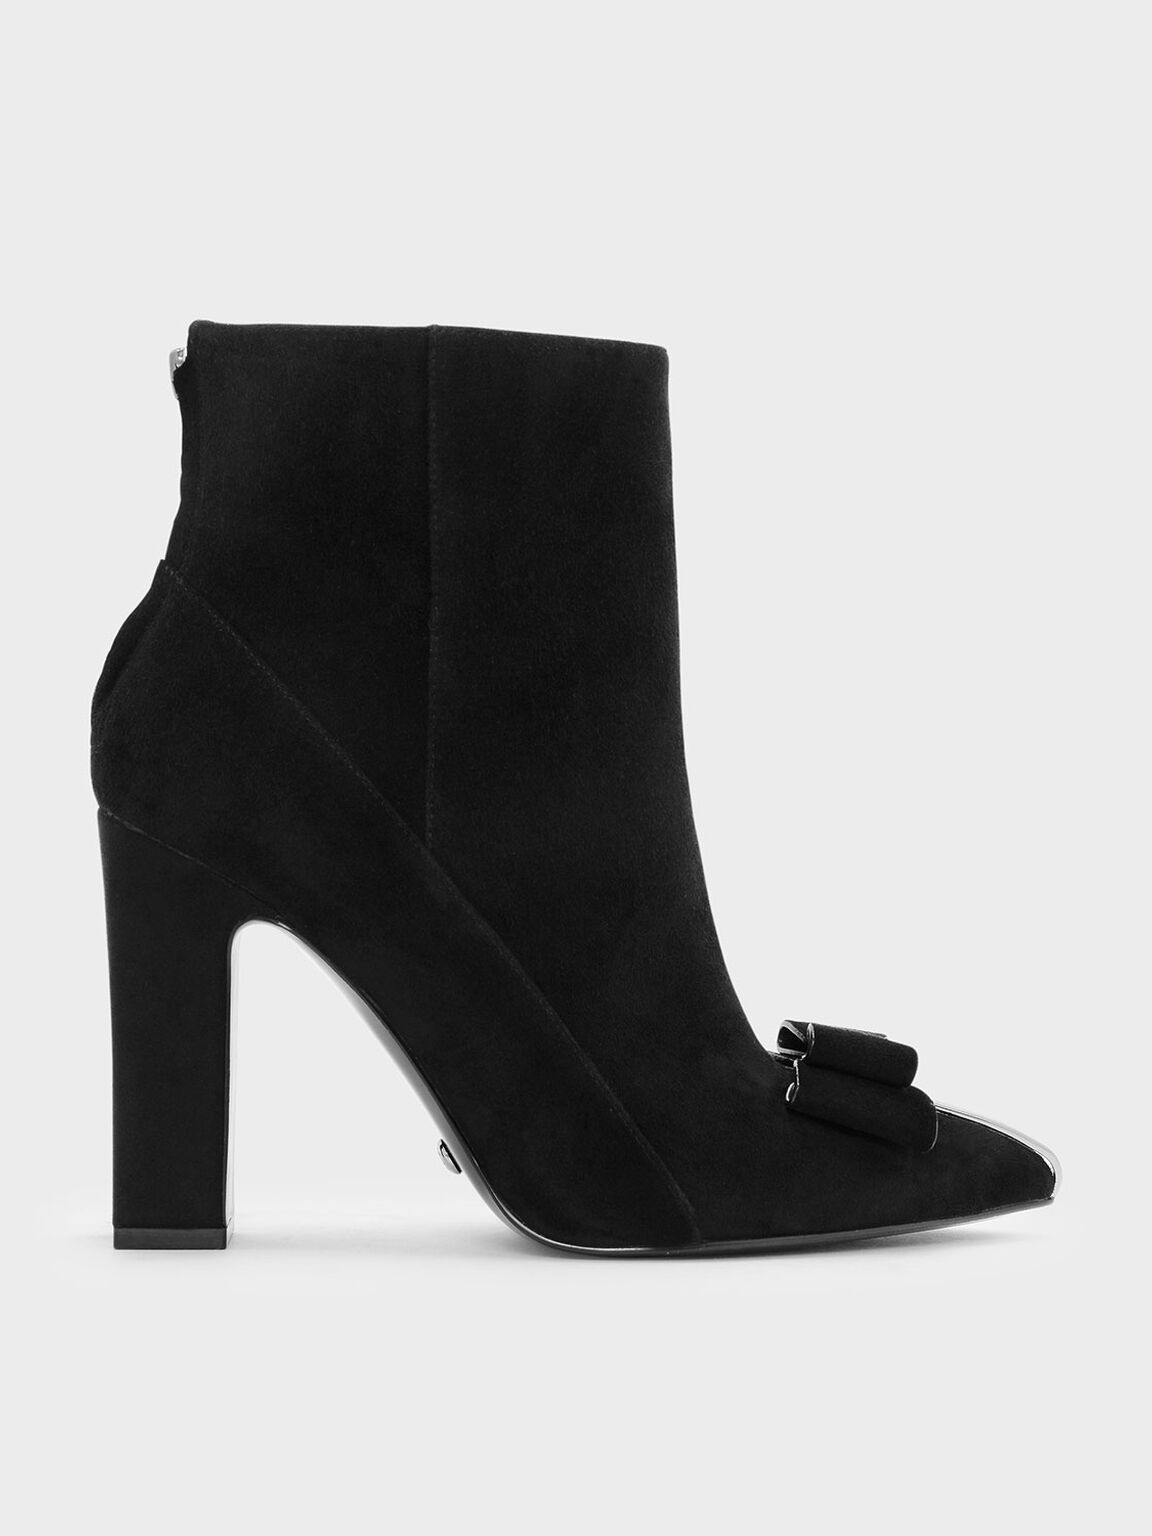 Bow Detail Suede Boots, Black, hi-res